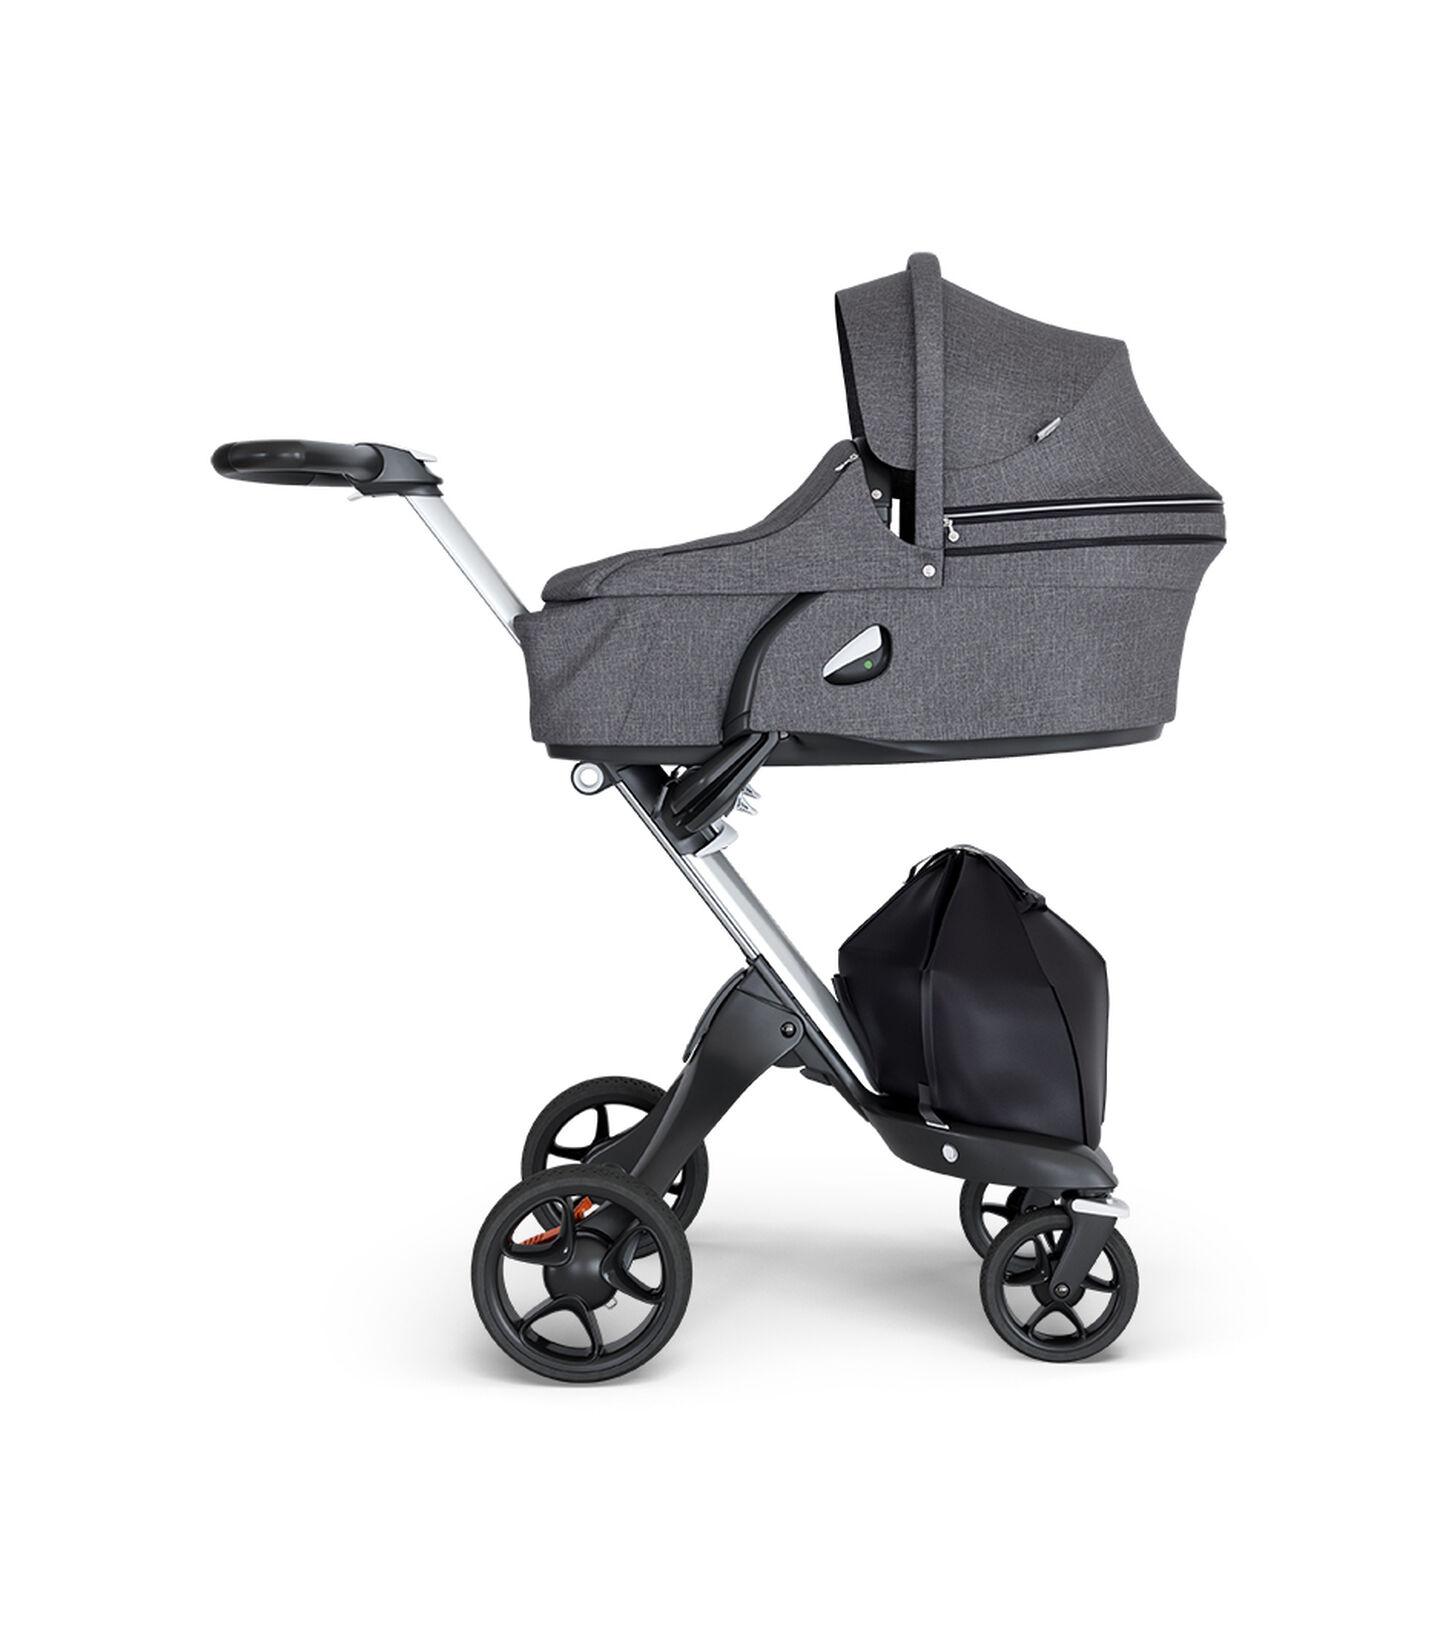 Stokke® Xplory® wtih Silver Chassis and Leatherette Black handle. Stokke® Stroller Carry Cot Black Melange.